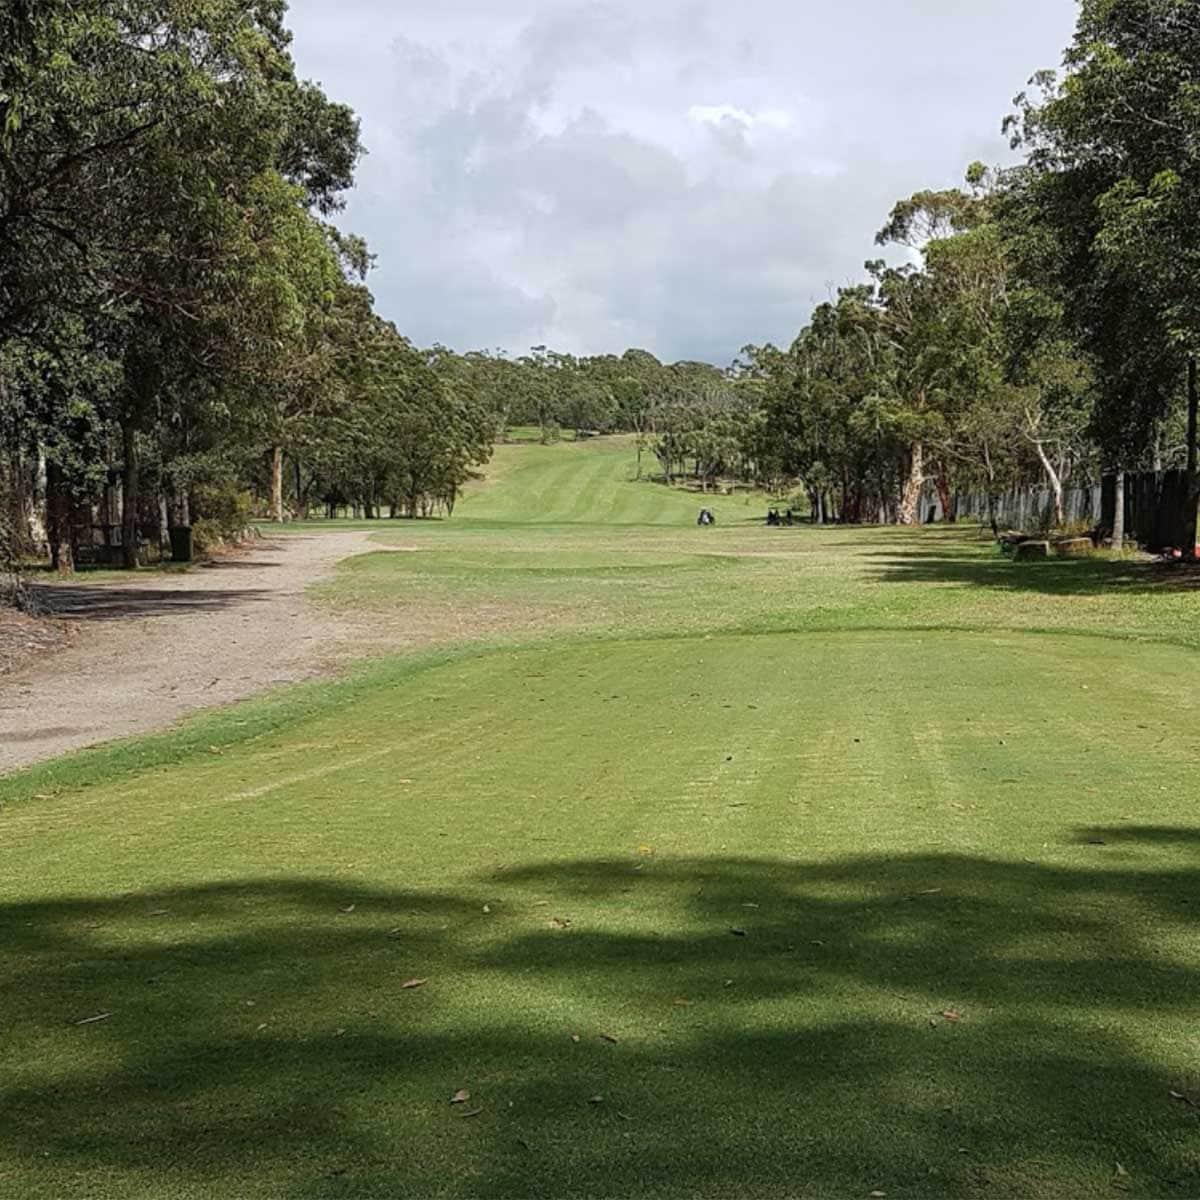 scenes around Charlestown Golf Club